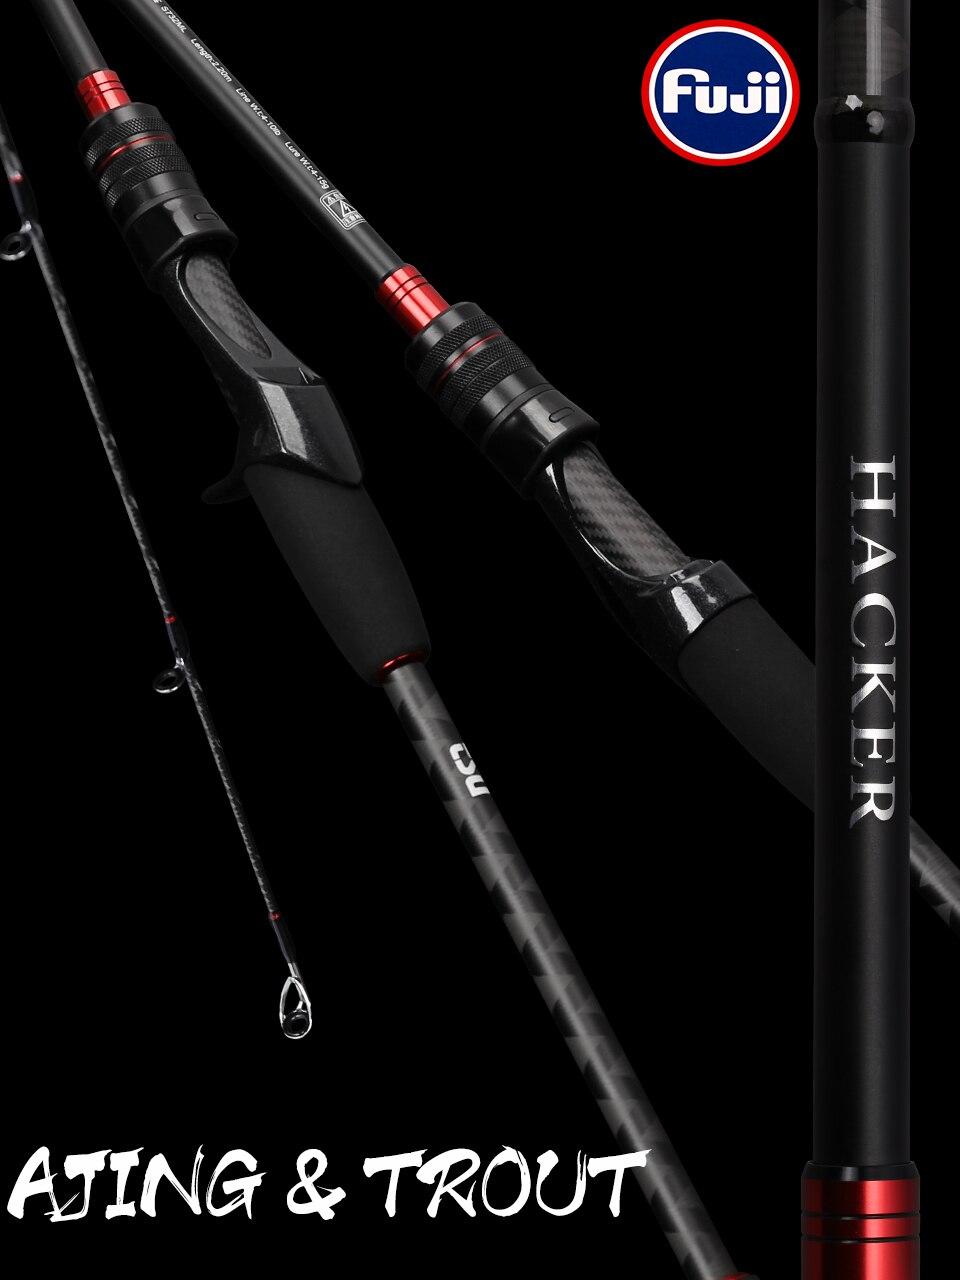 TSURINOYA UL AJING Forelle Rod 6,8 ft Hacker 2,04 m 2 Abschnitt Lange Casting Spinning Angelrute FUJI Guide Ringe action Medium Schnelle